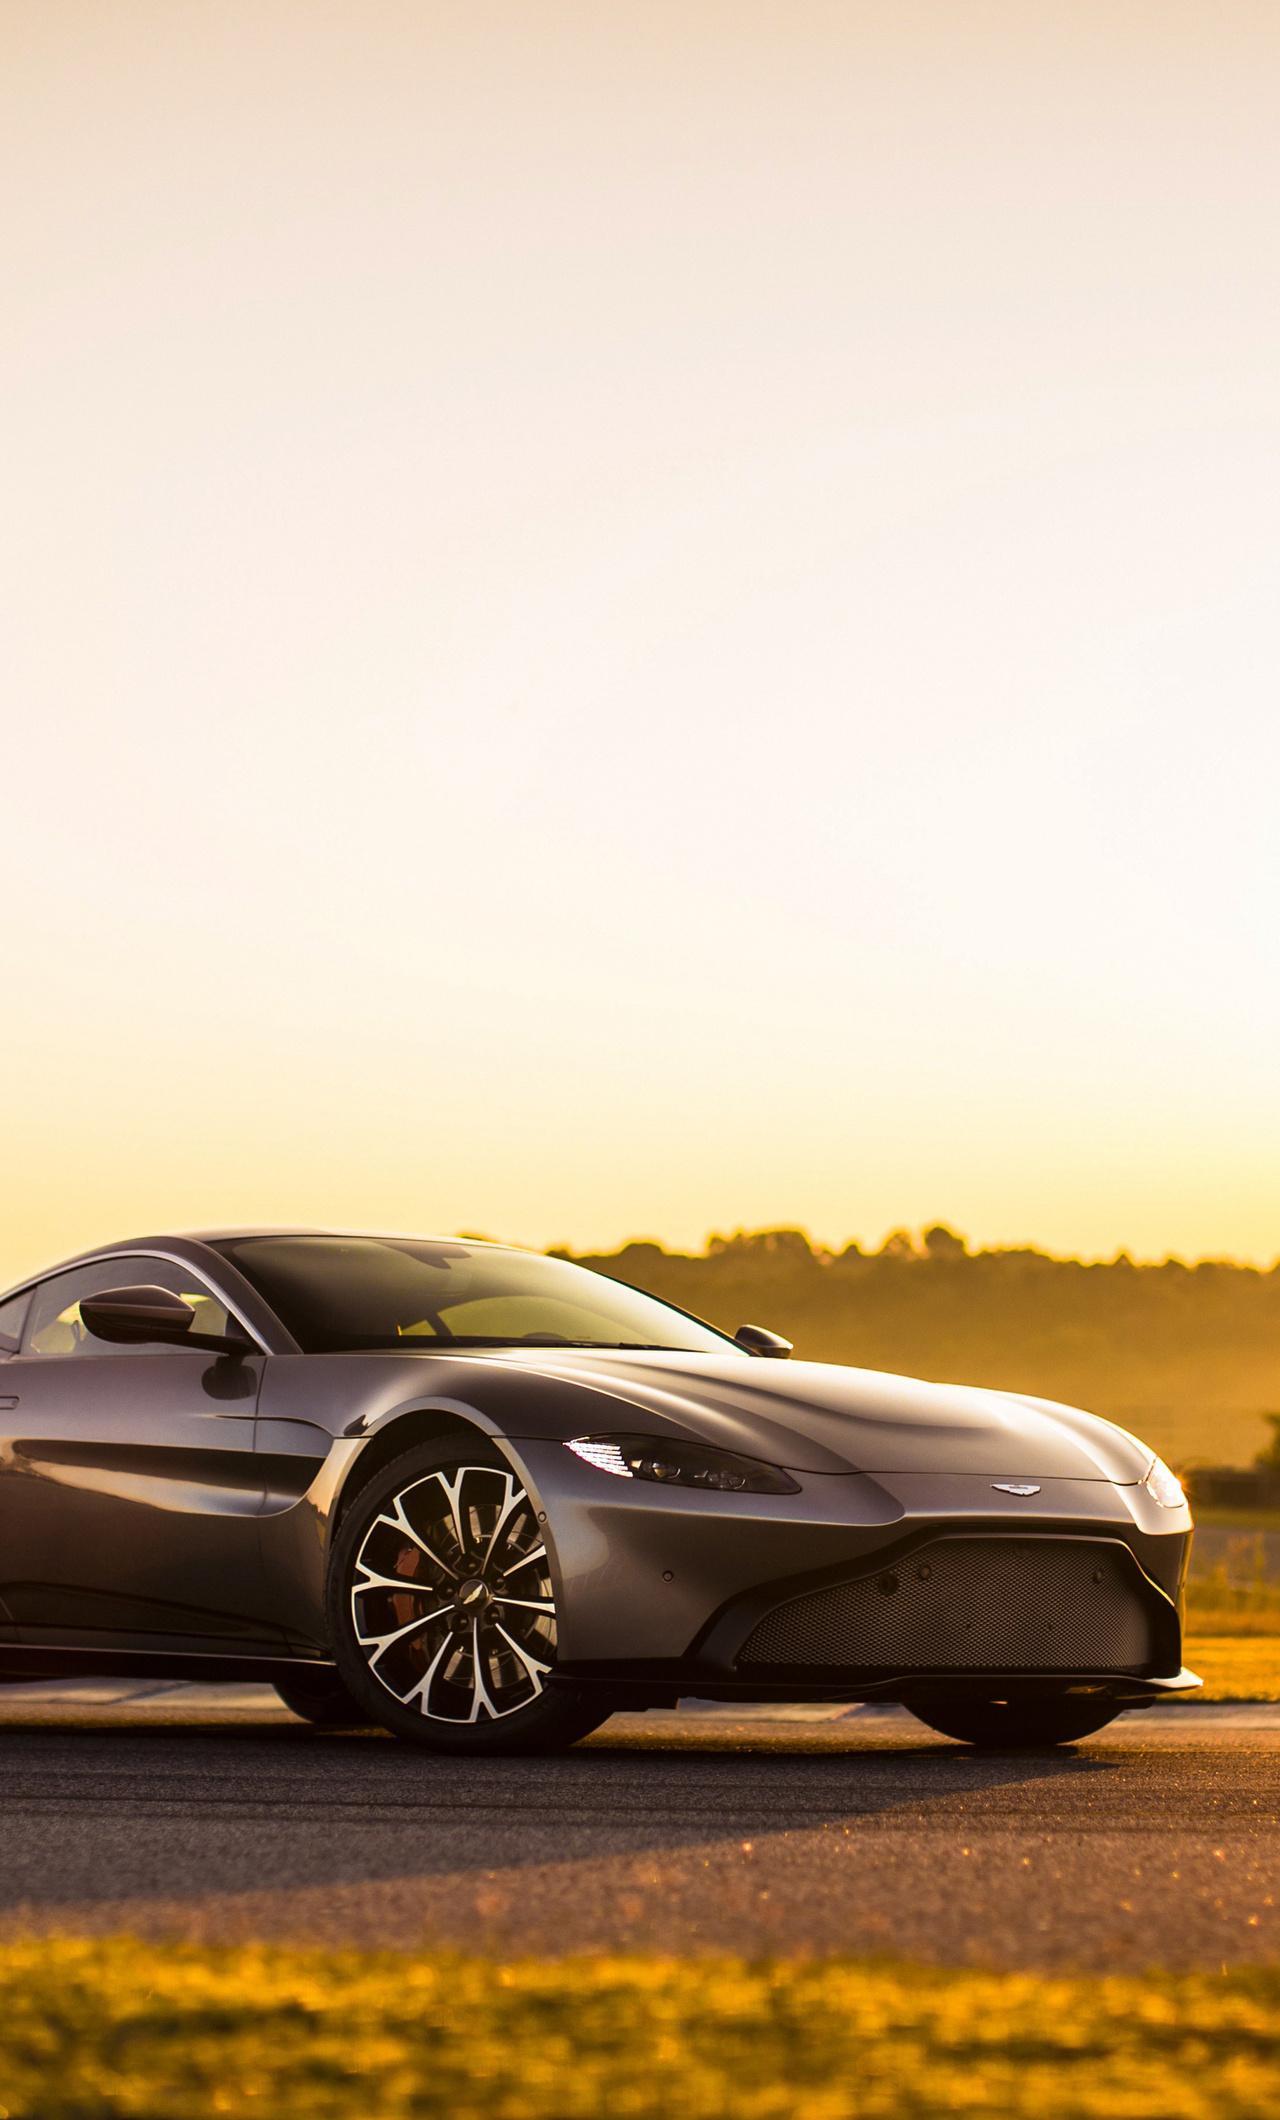 1280x2120 Aston Martin Vantage 2018 Iphone 6 Hd 4k Wallpapers